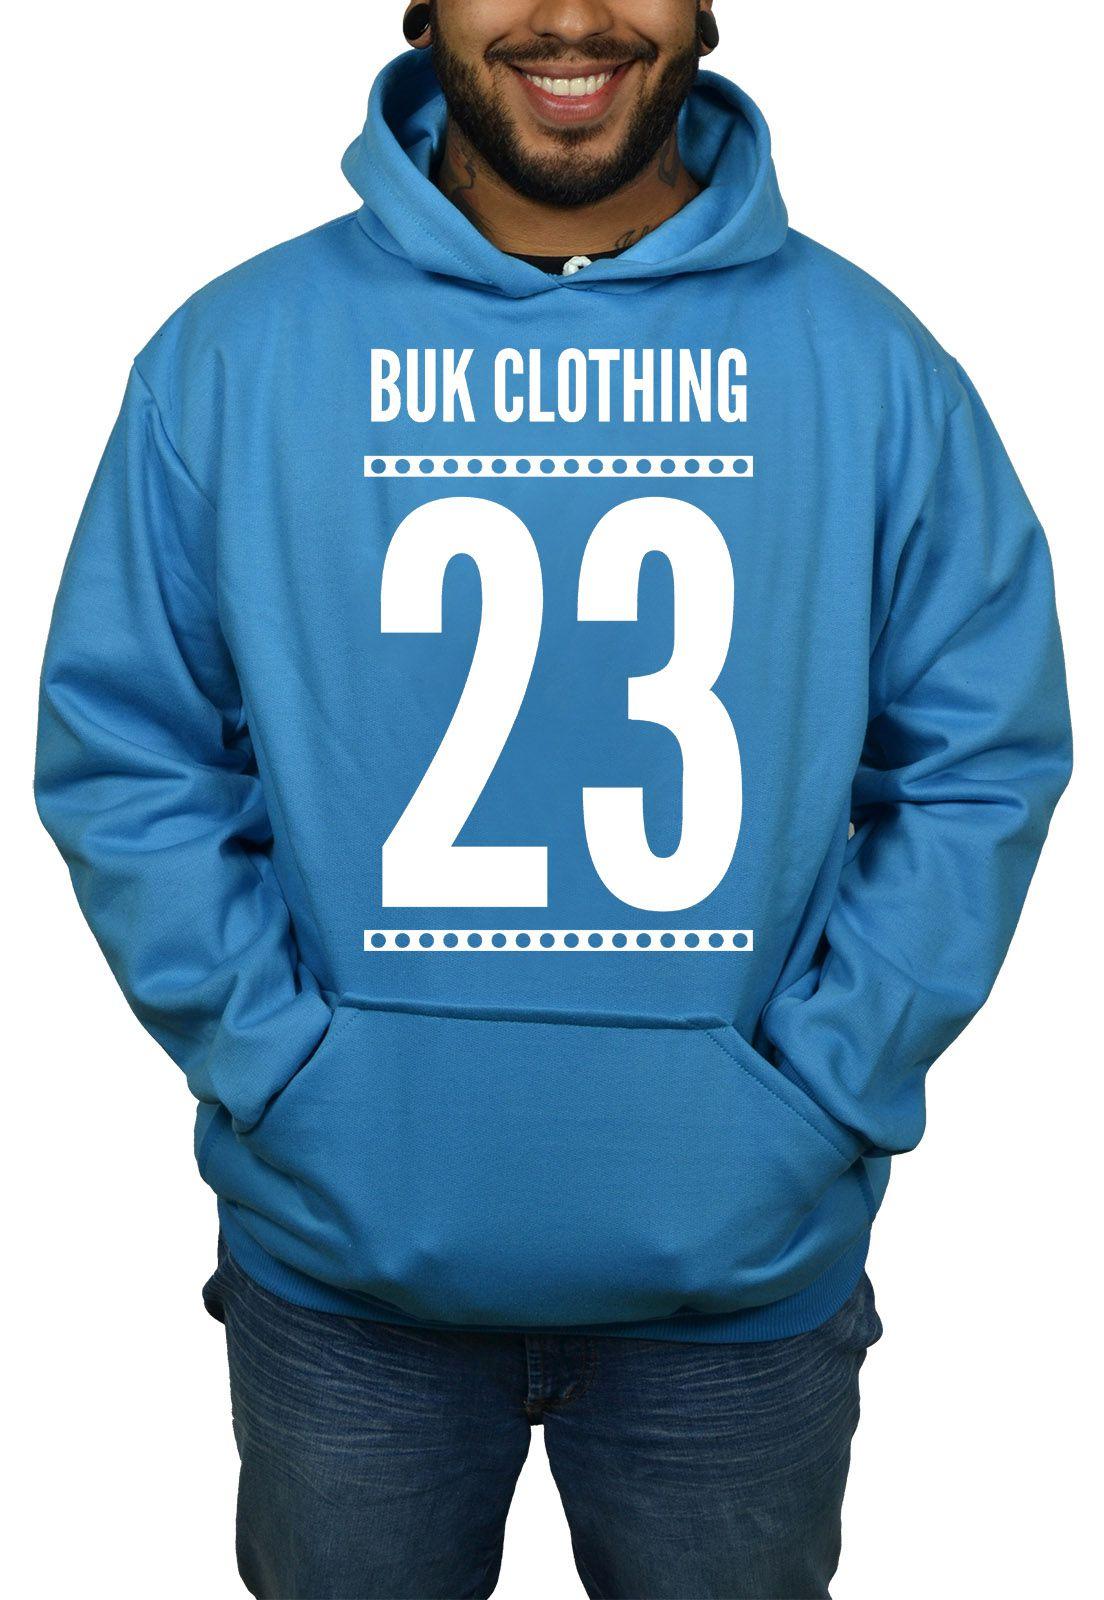 Moletom BUK 23 - Azul Turquesa  - HShop